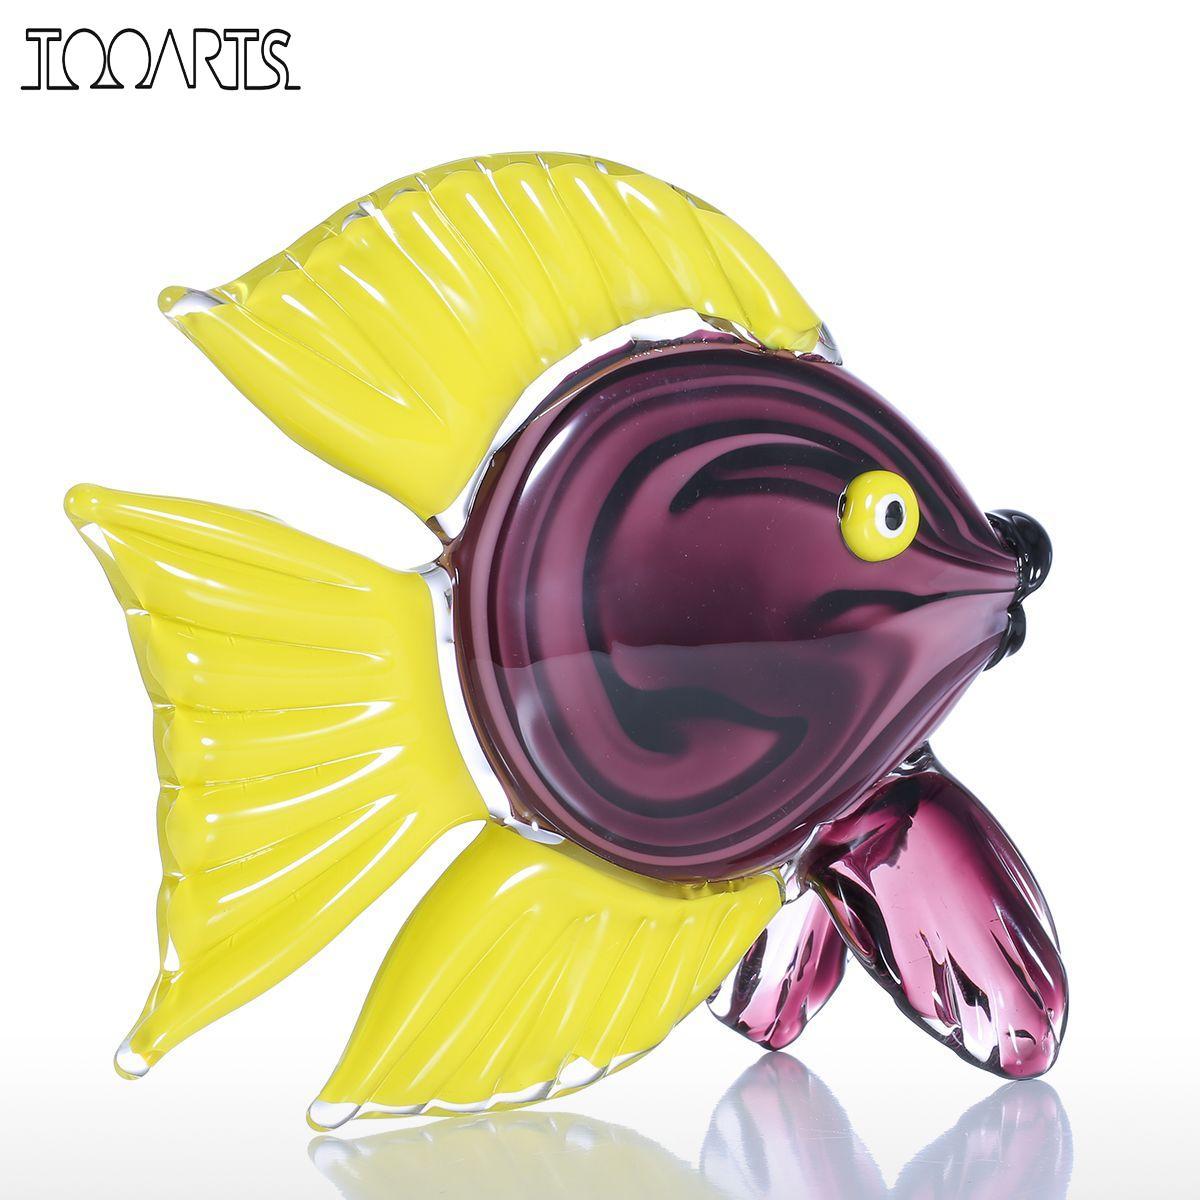 Tooarts Yellow Tropical Fish Glass Figurine Home Decor Animal ...